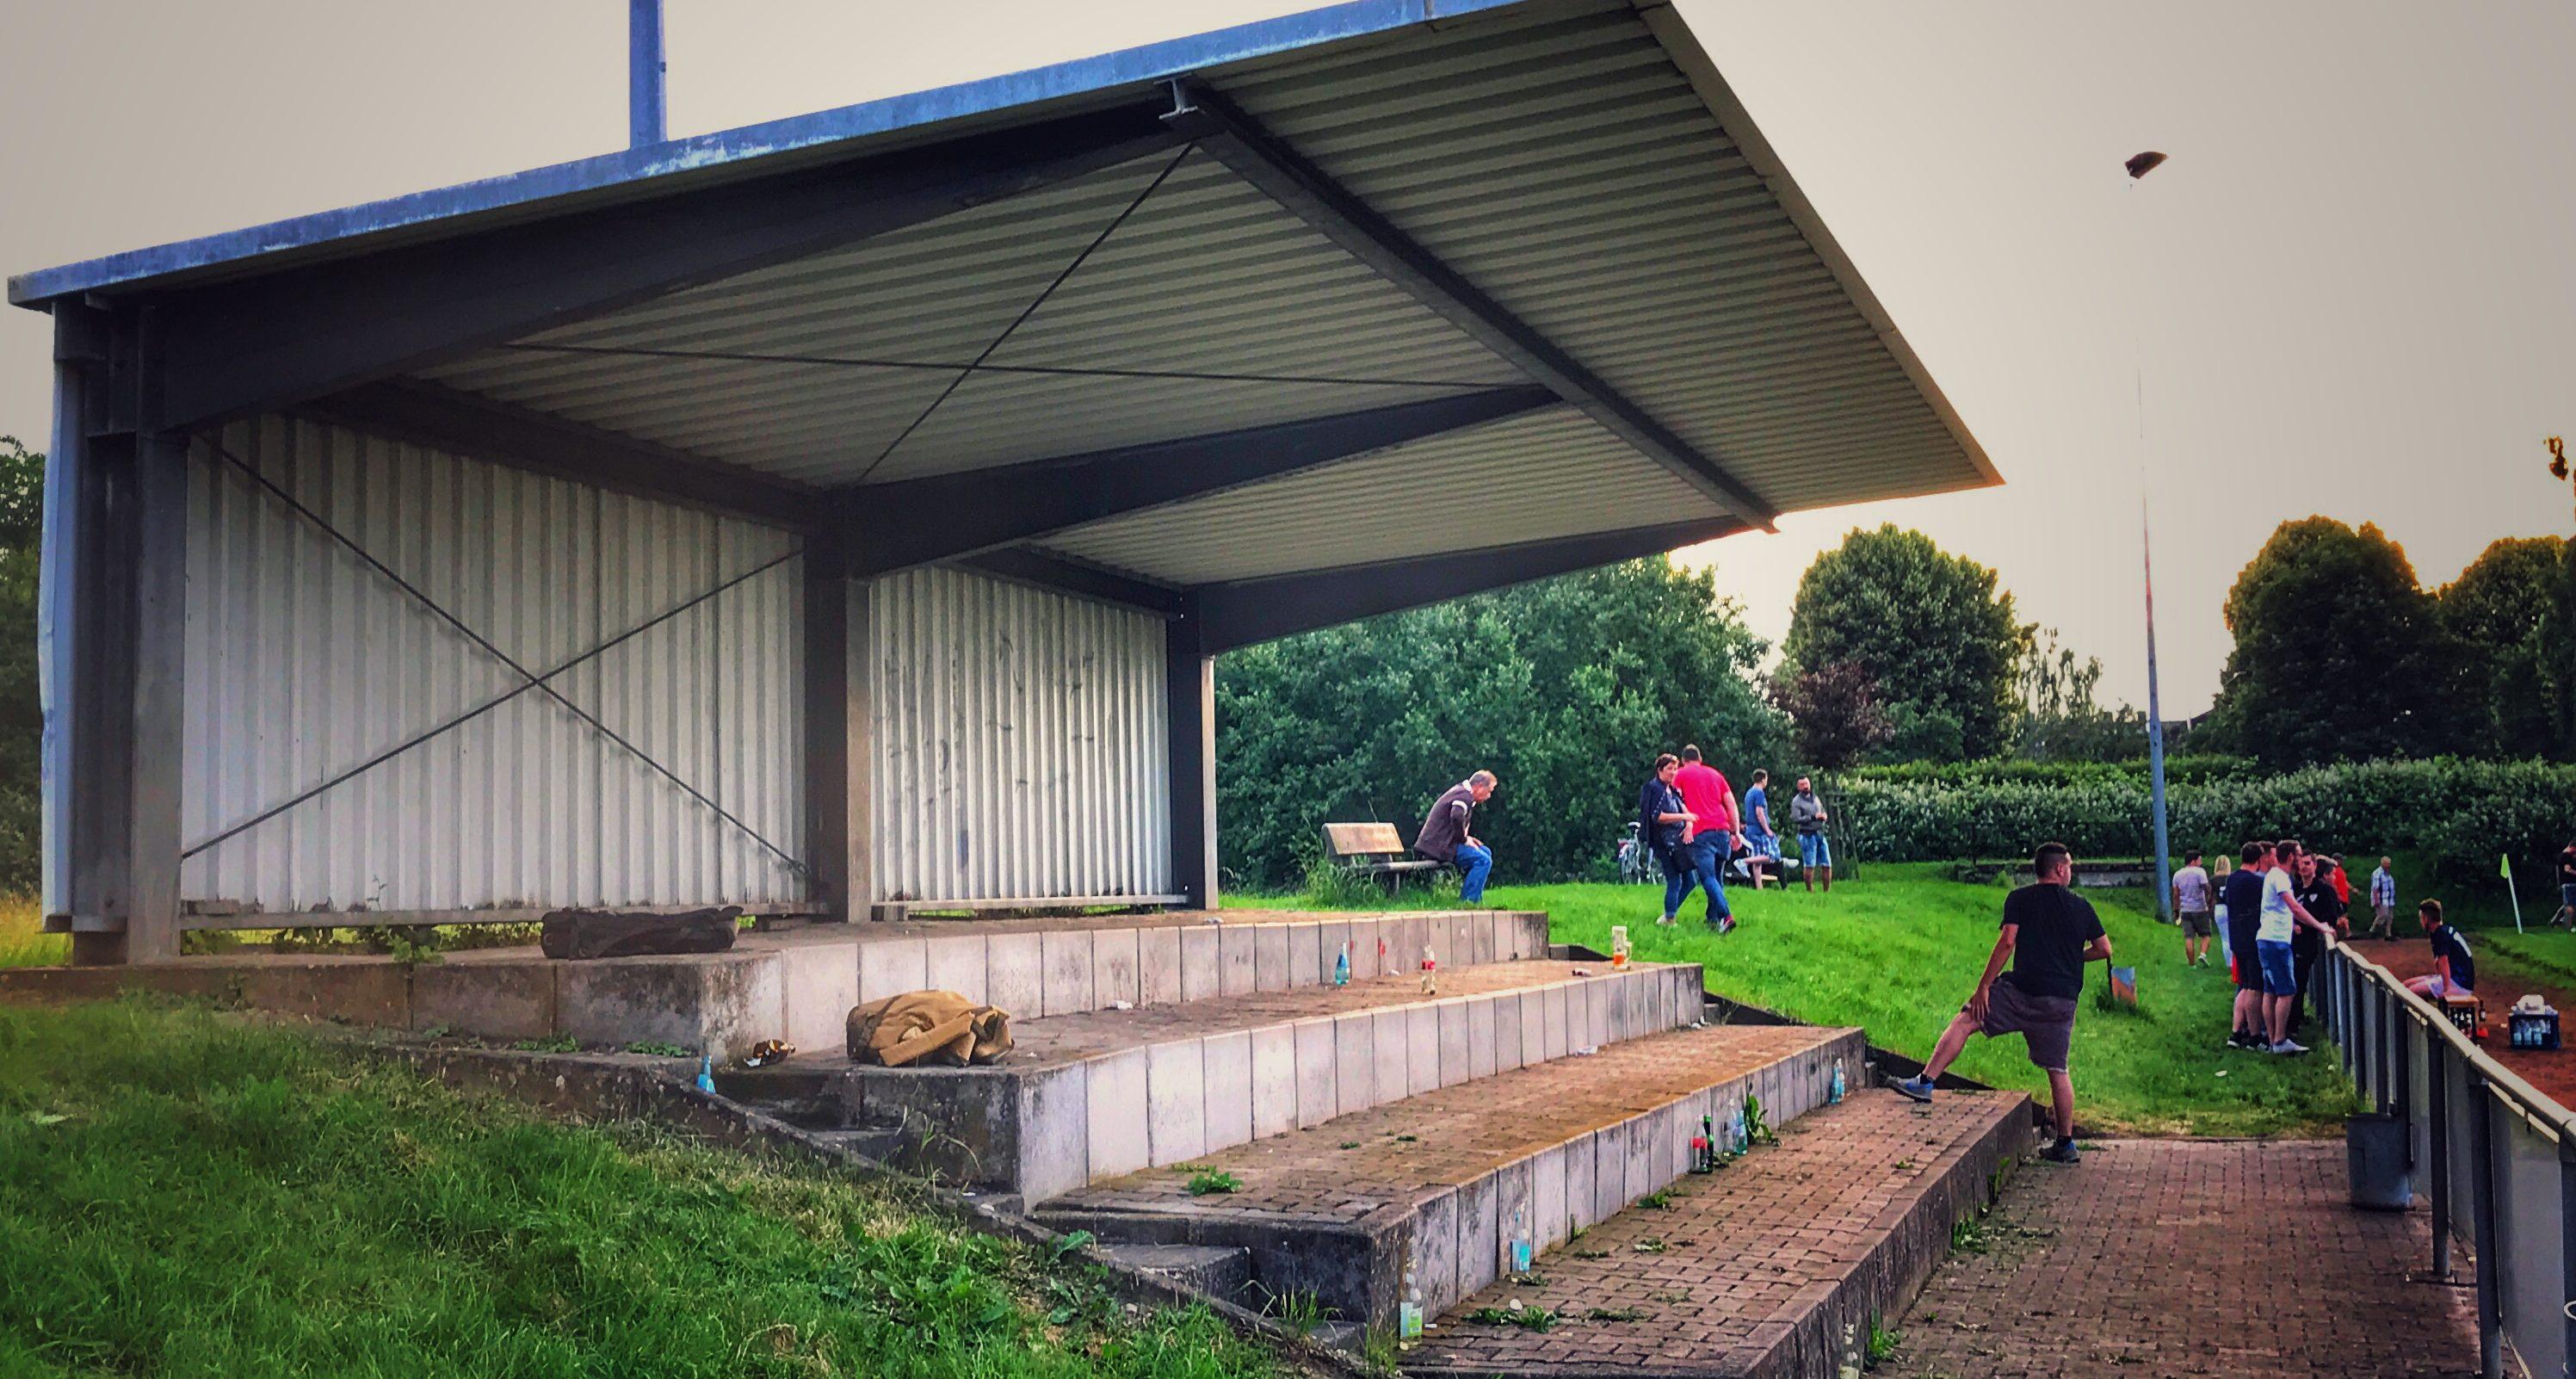 Melbach – Sportanlage Melbach